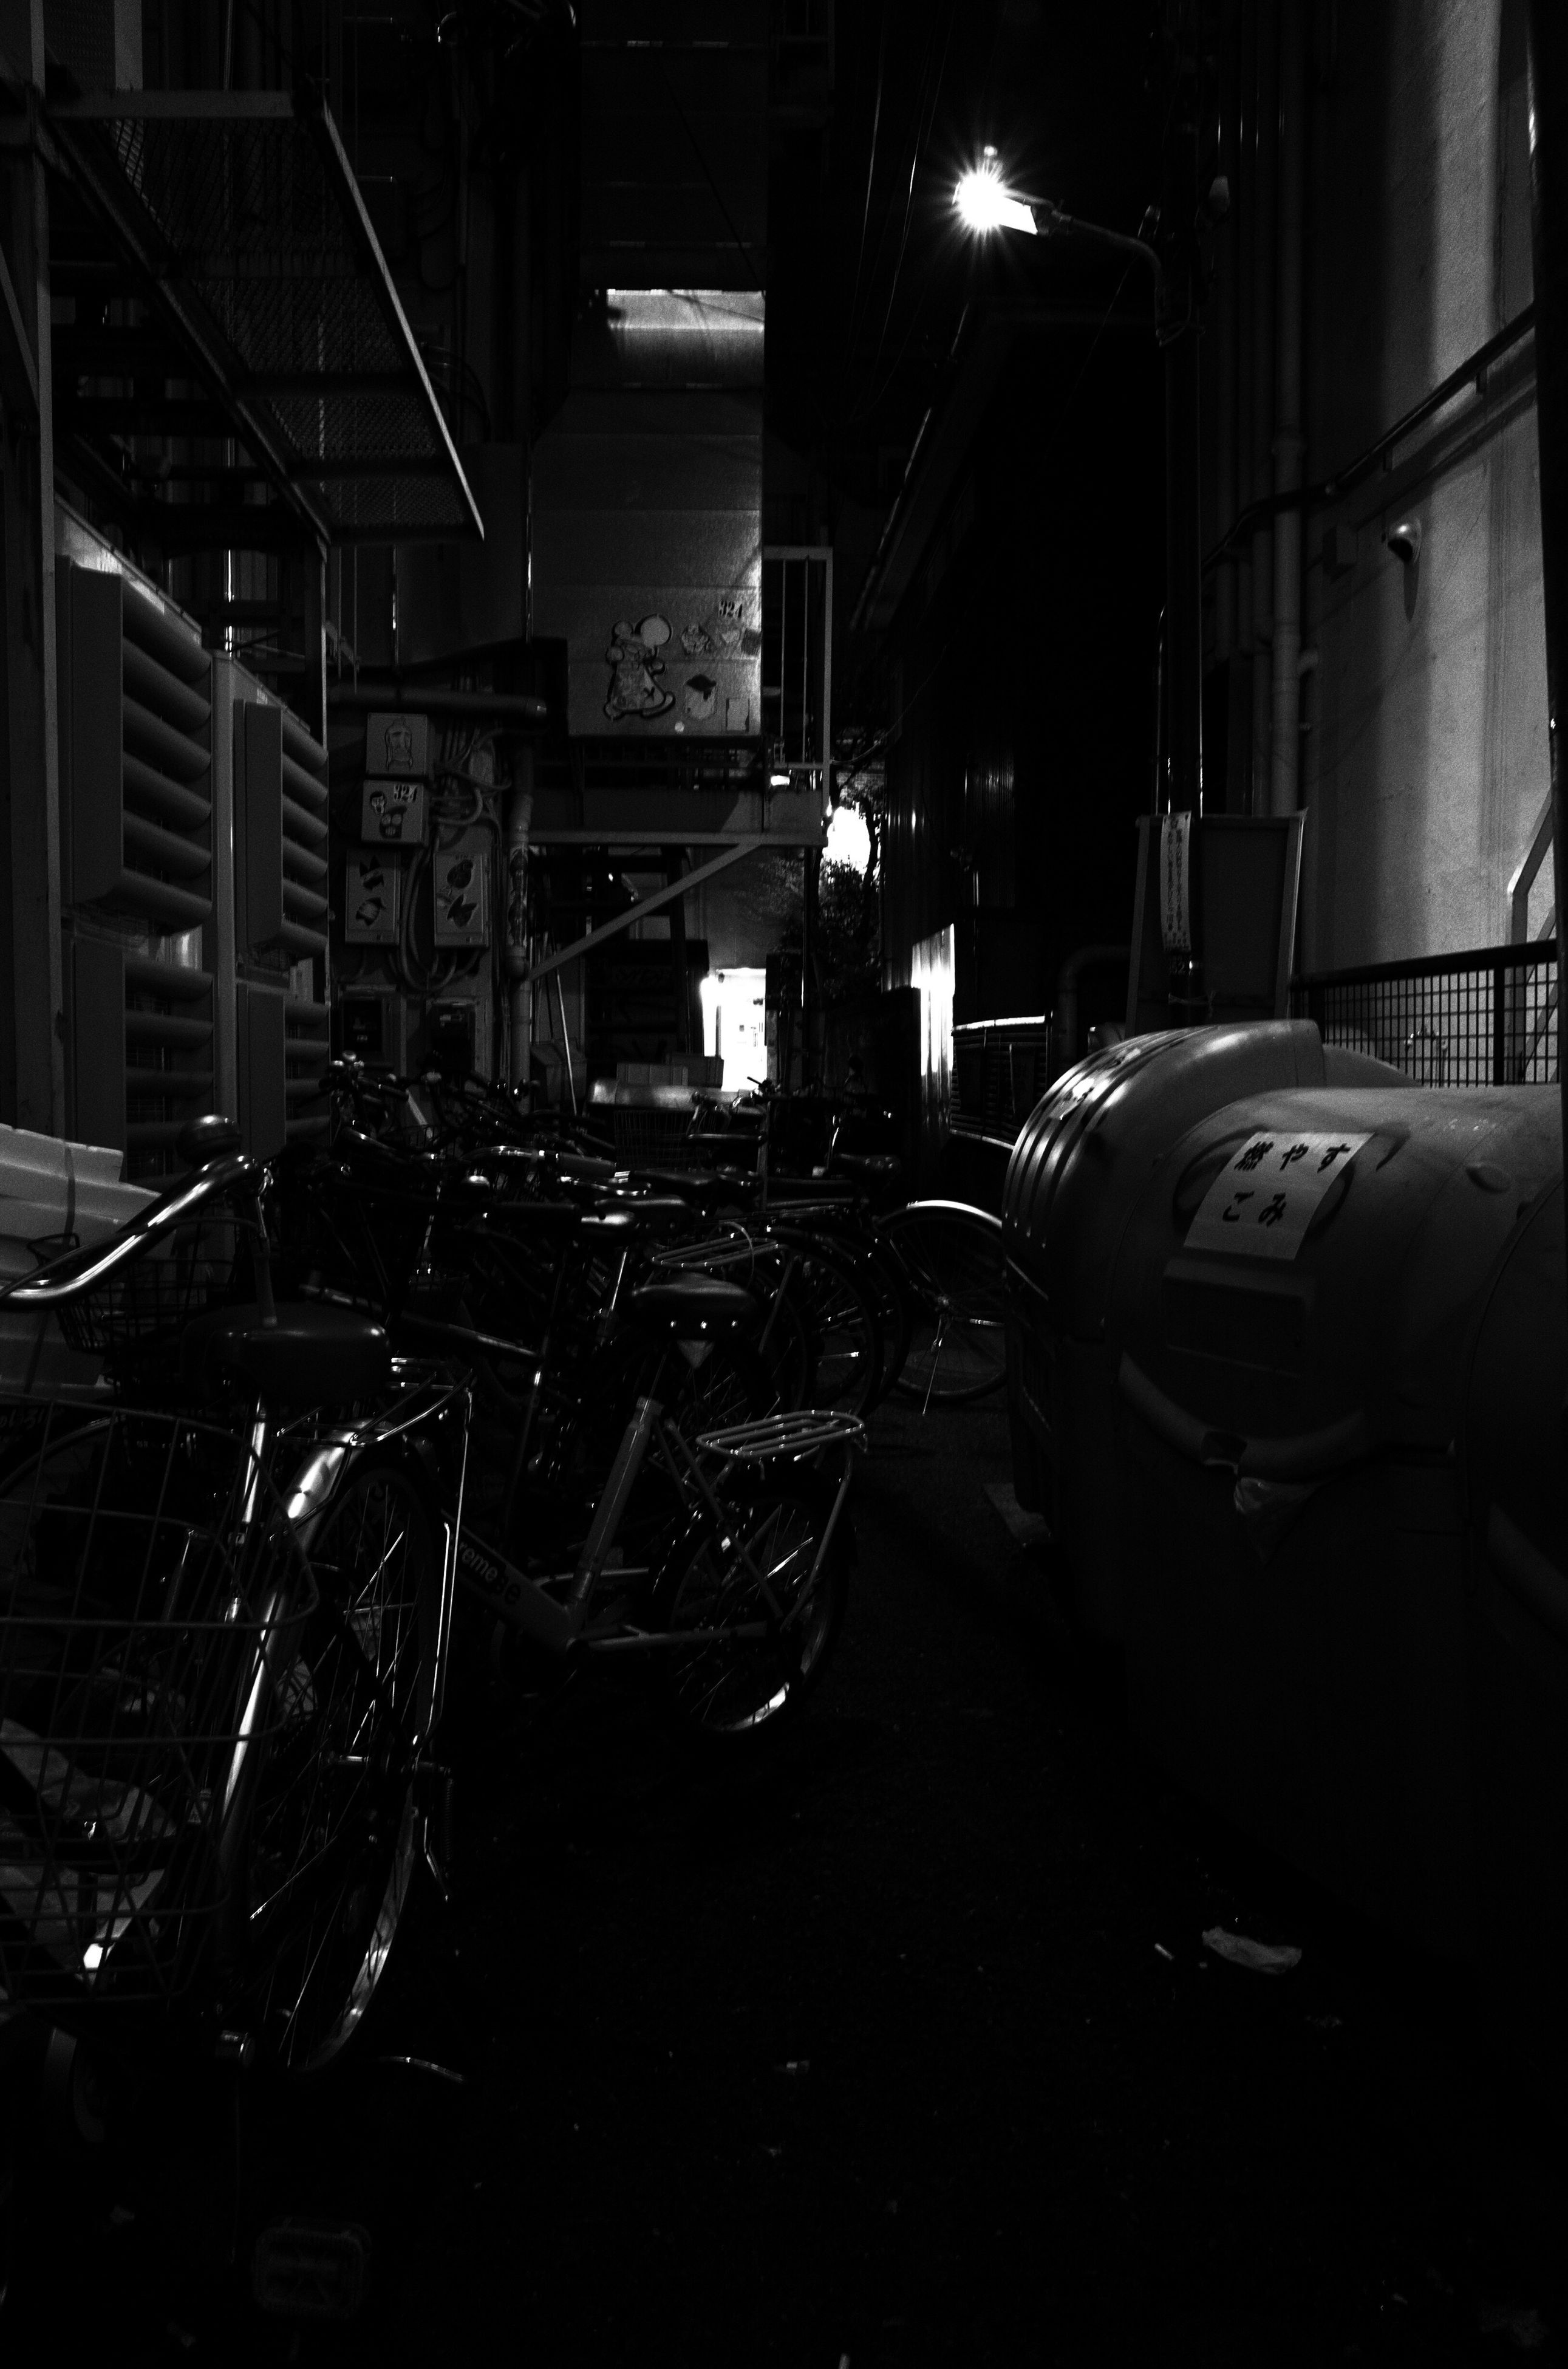 indoors, illuminated, no people, night, film industry